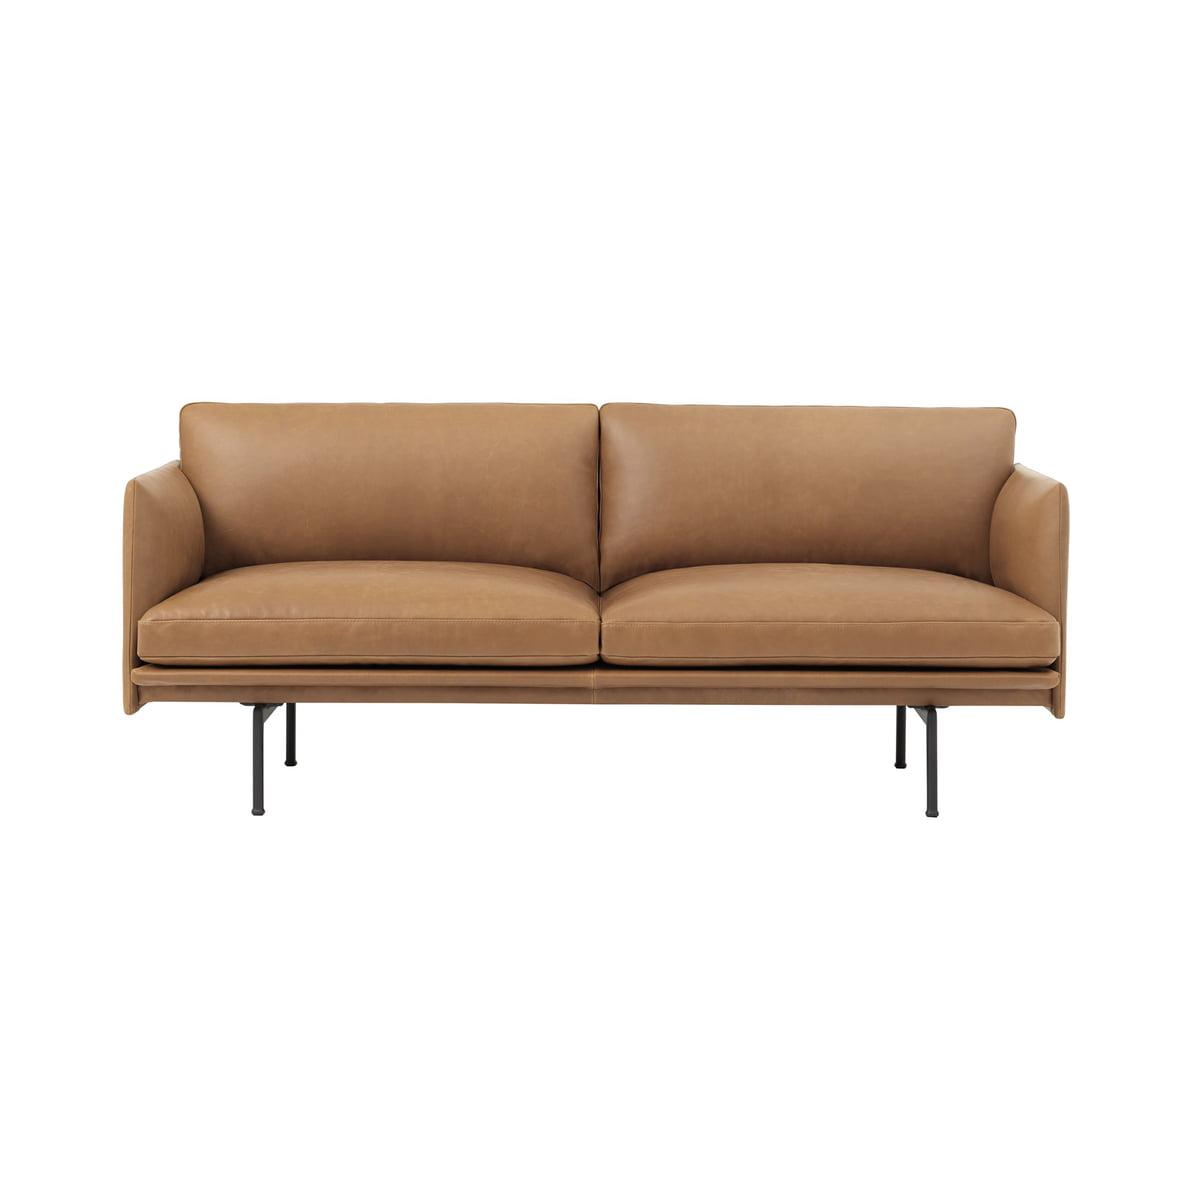 Wondrous Muuto Outline Sofa 2 Seater Cognac Silk Leather Traffic Black Ral 9017 Uk Download Free Architecture Designs Scobabritishbridgeorg